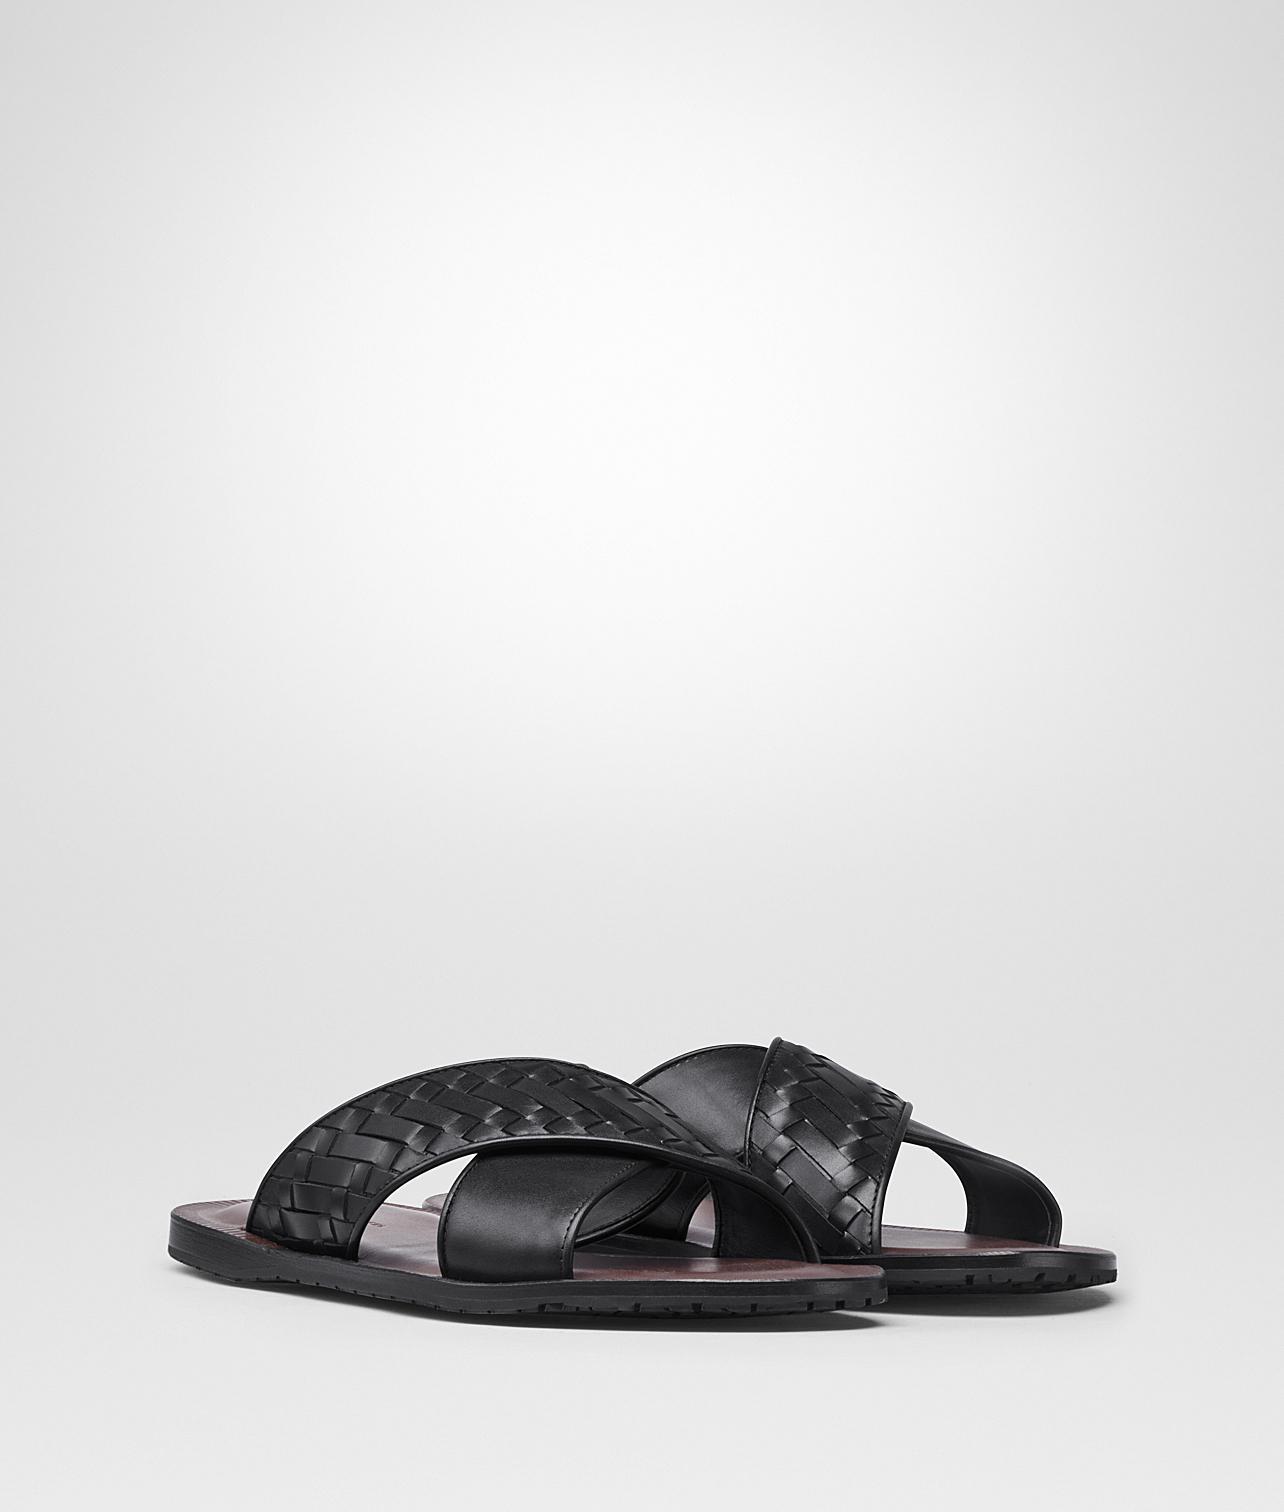 10506294172a Bottega Veneta - Black Nero Intrecciato Calf Sapa Crisscross Sandal for Men  - Lyst. View fullscreen